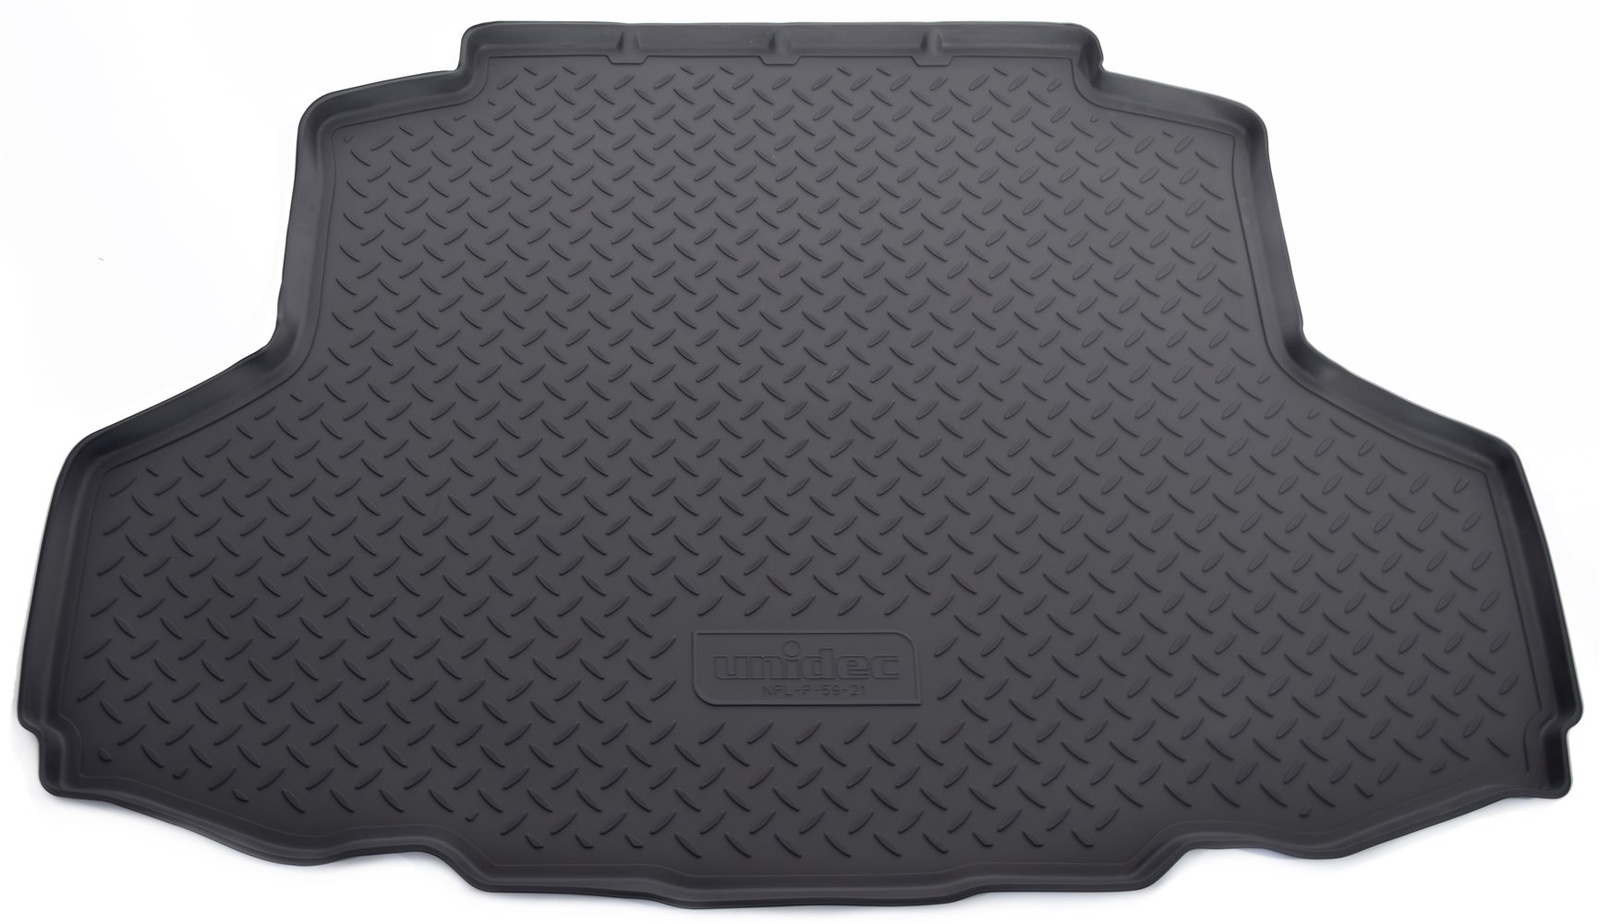 Коврик для багажника Norplast для mitsubishi pajero ii, 1990-2000, 3 дв, npl-p-59-43, черный коврик багажника полиуретан чёрный 2awd norplast npl p 69 04 для renault duster 2011